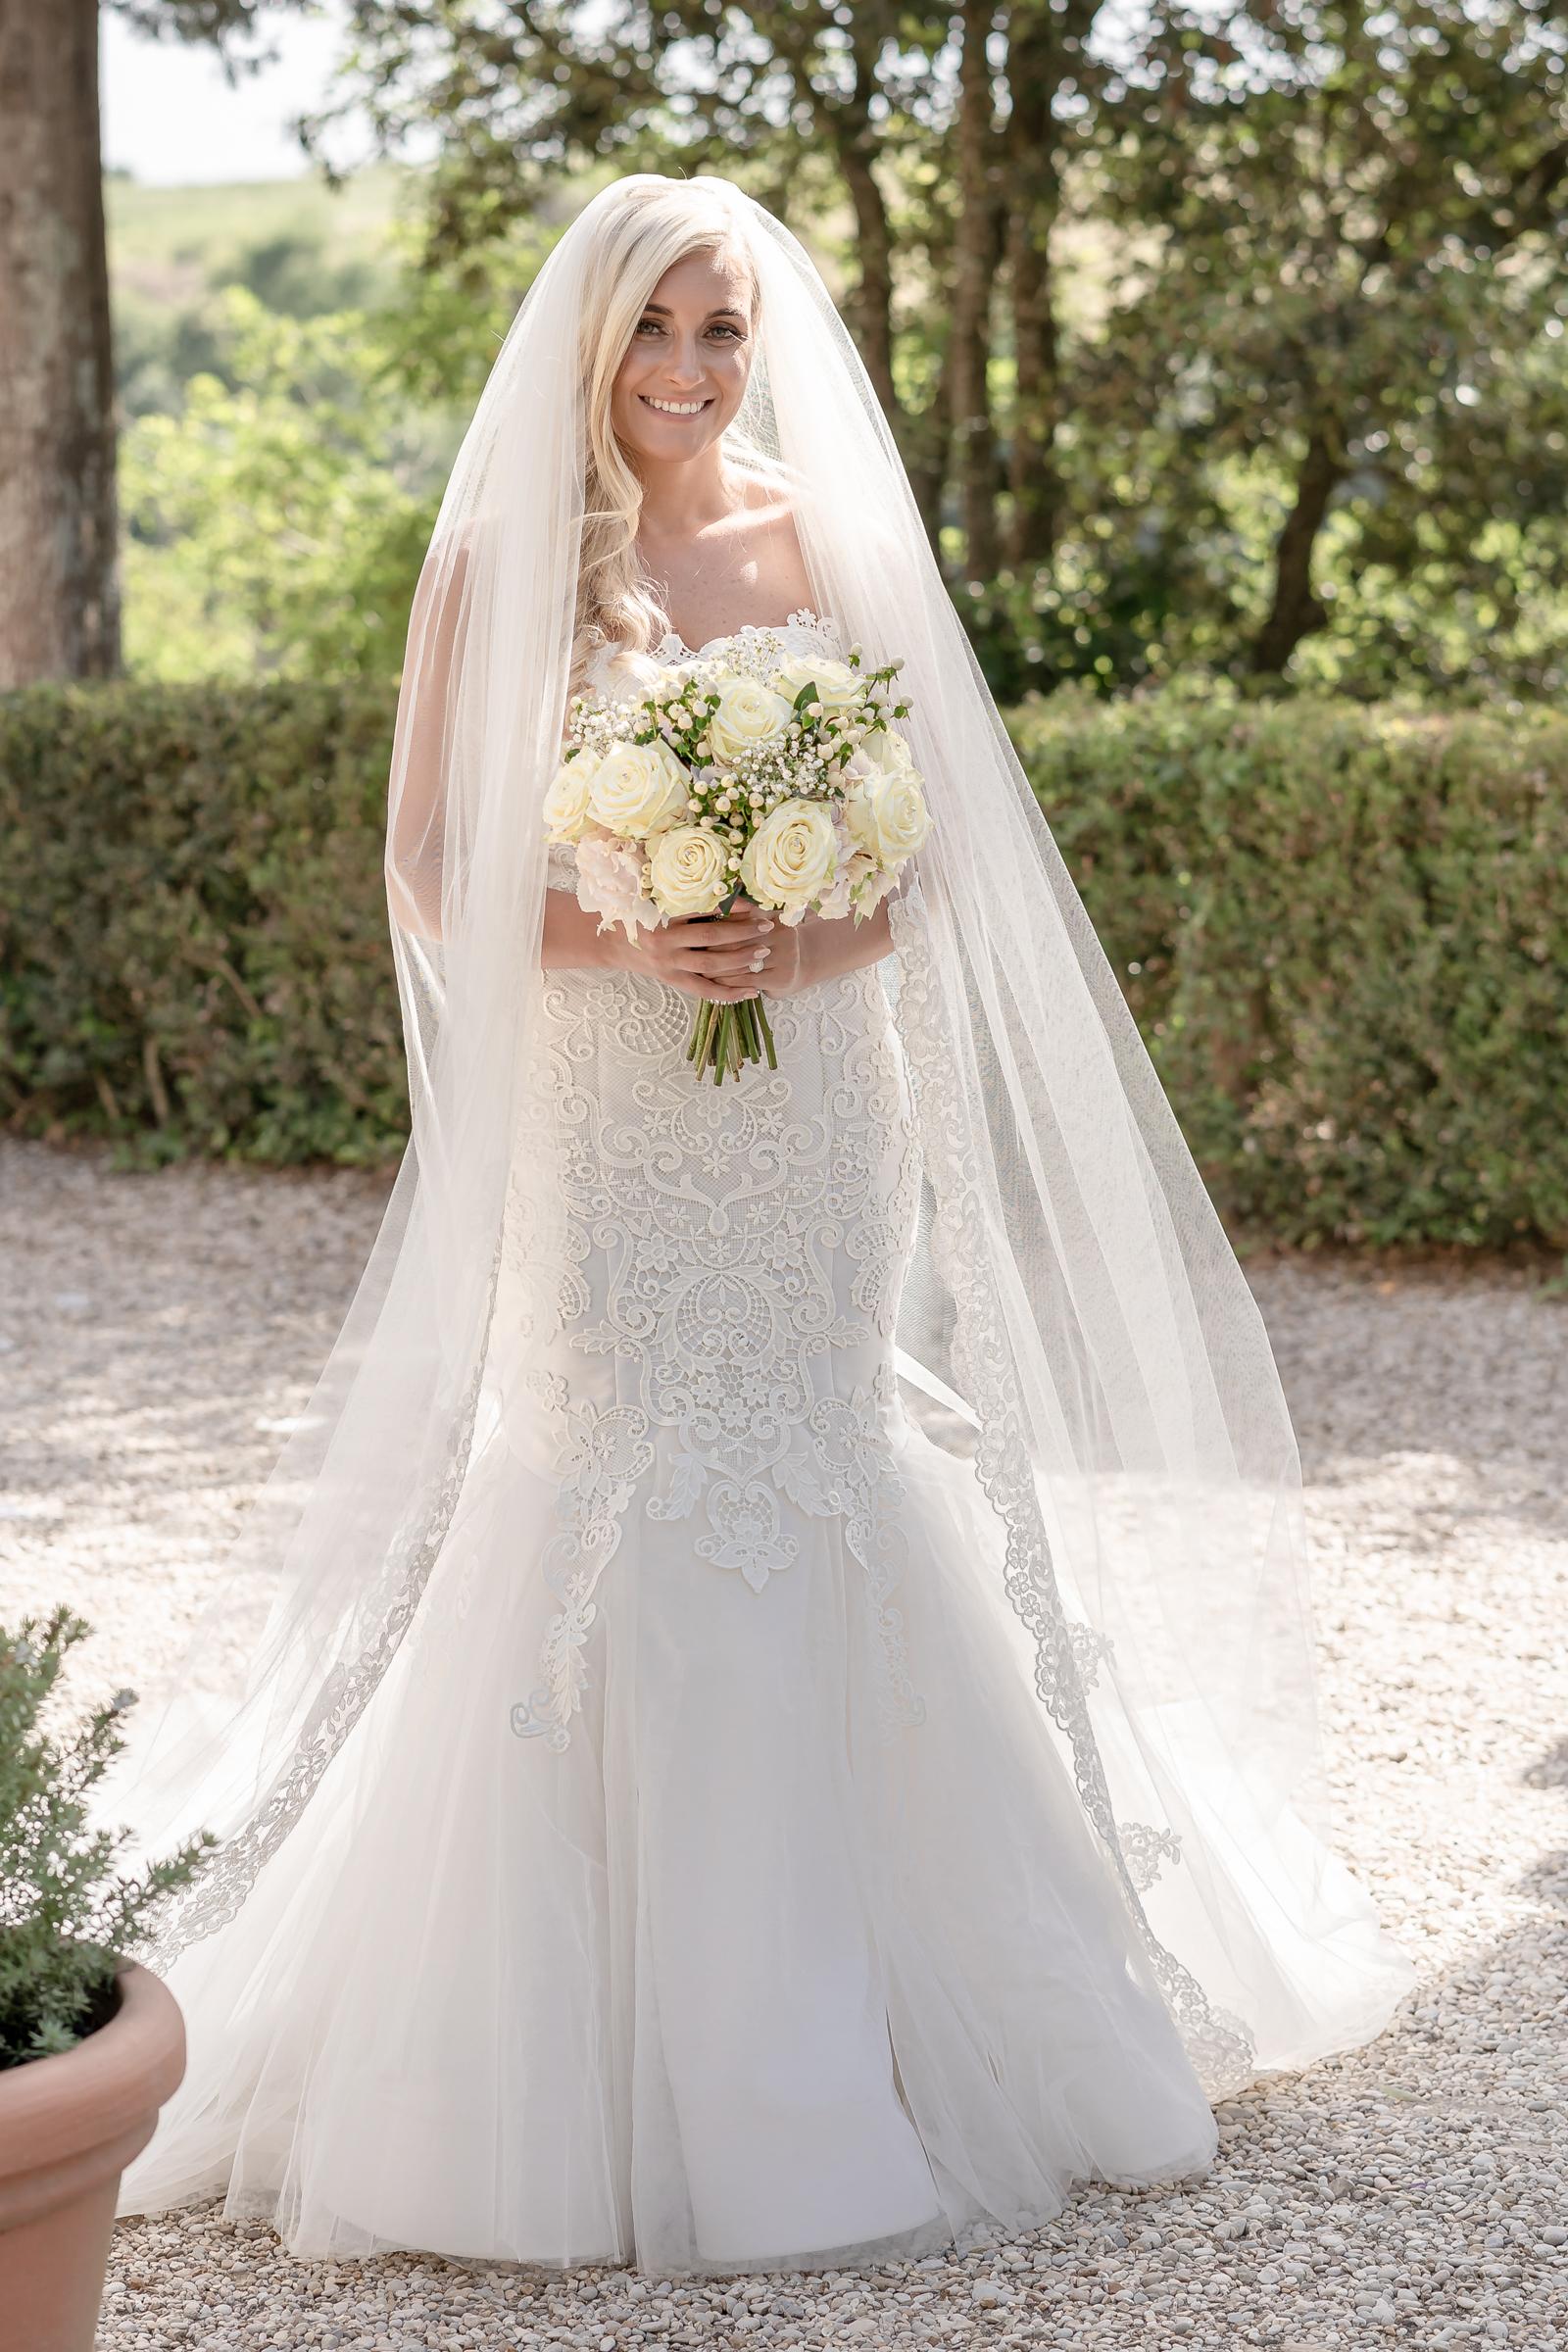 Borgo di tragliata Wedding-24.jpg